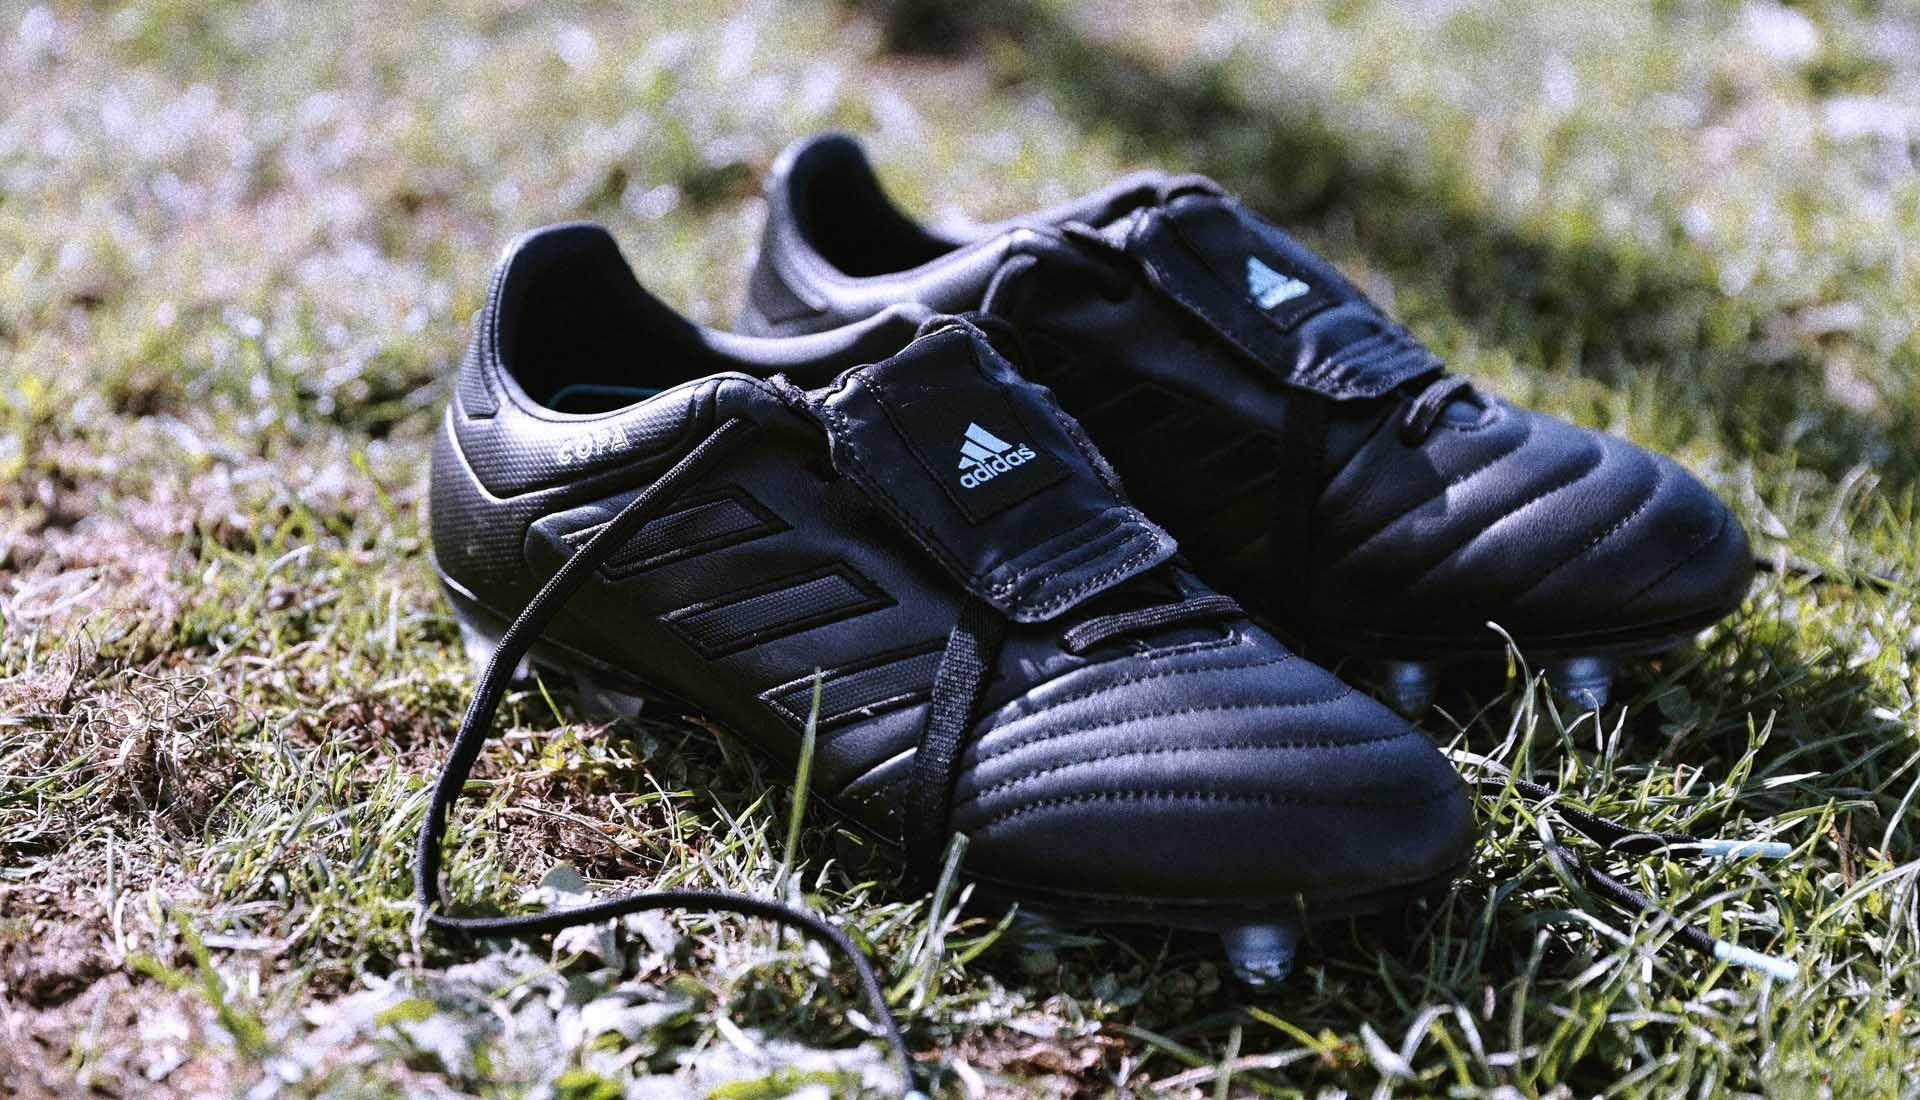 Pericia pala Sangriento  Adidas Copa Gloro 19.2 FG - Core Black/Grey D98061 em 2020 | Tênis todo  preto, Adidas